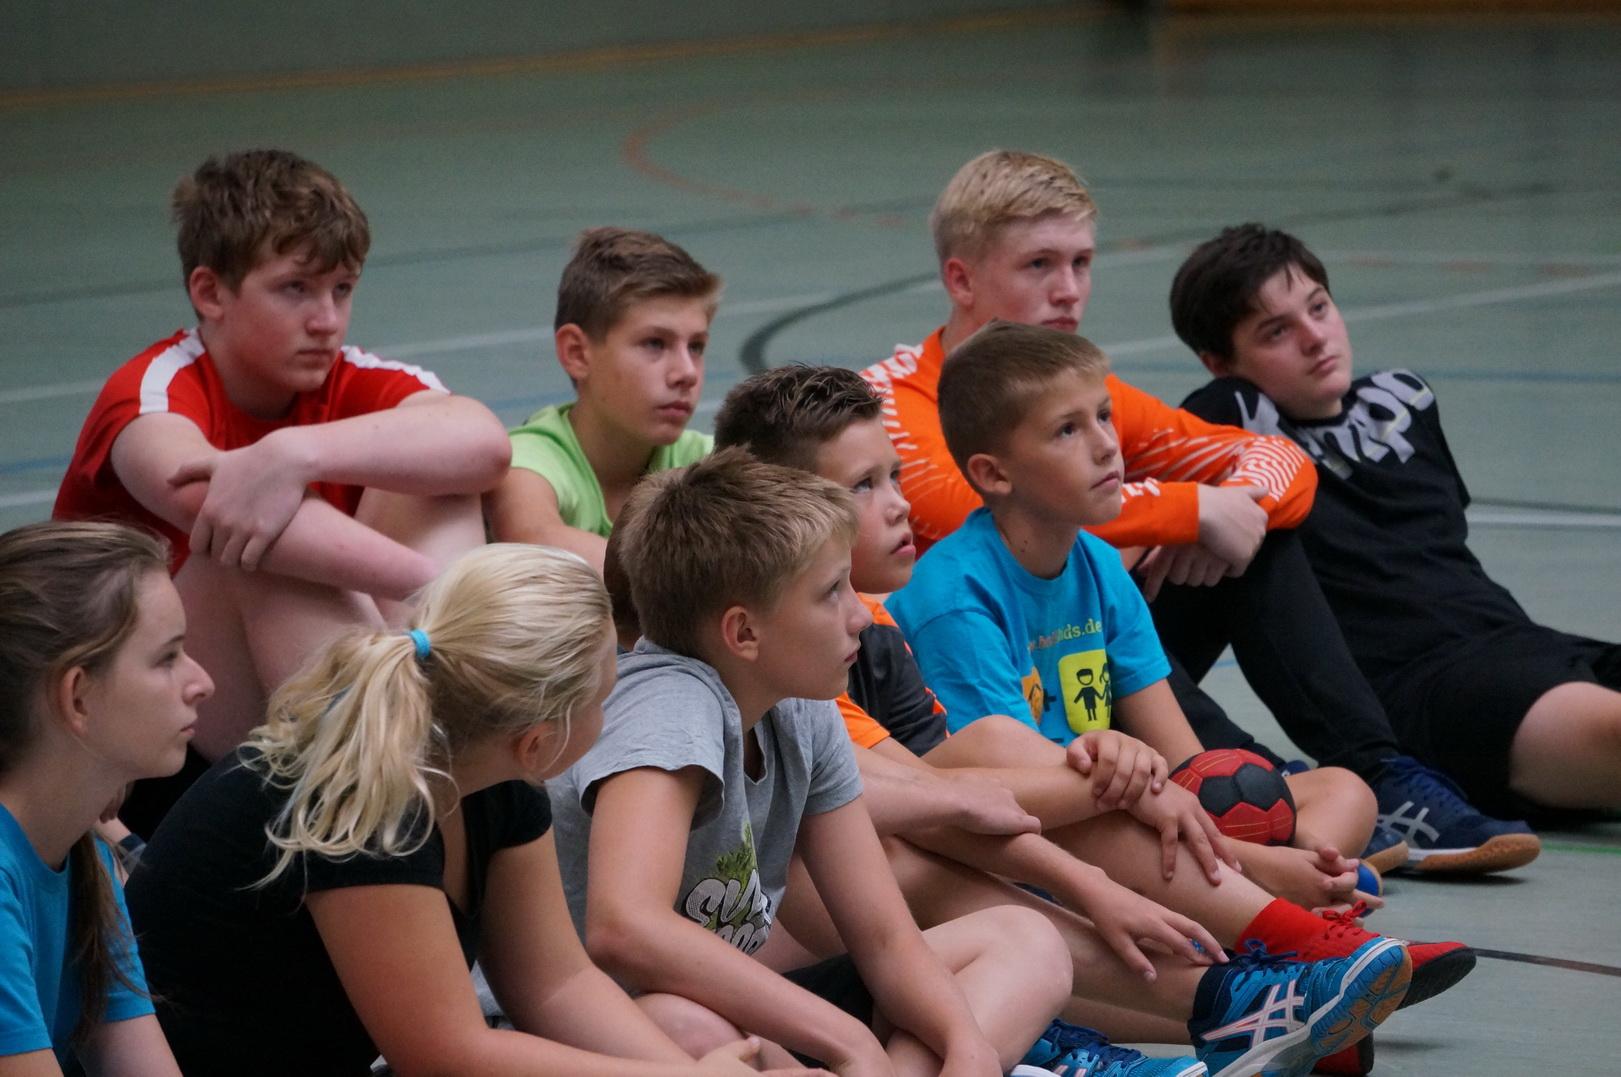 201808_Handballcamp_SDH_MG_020w